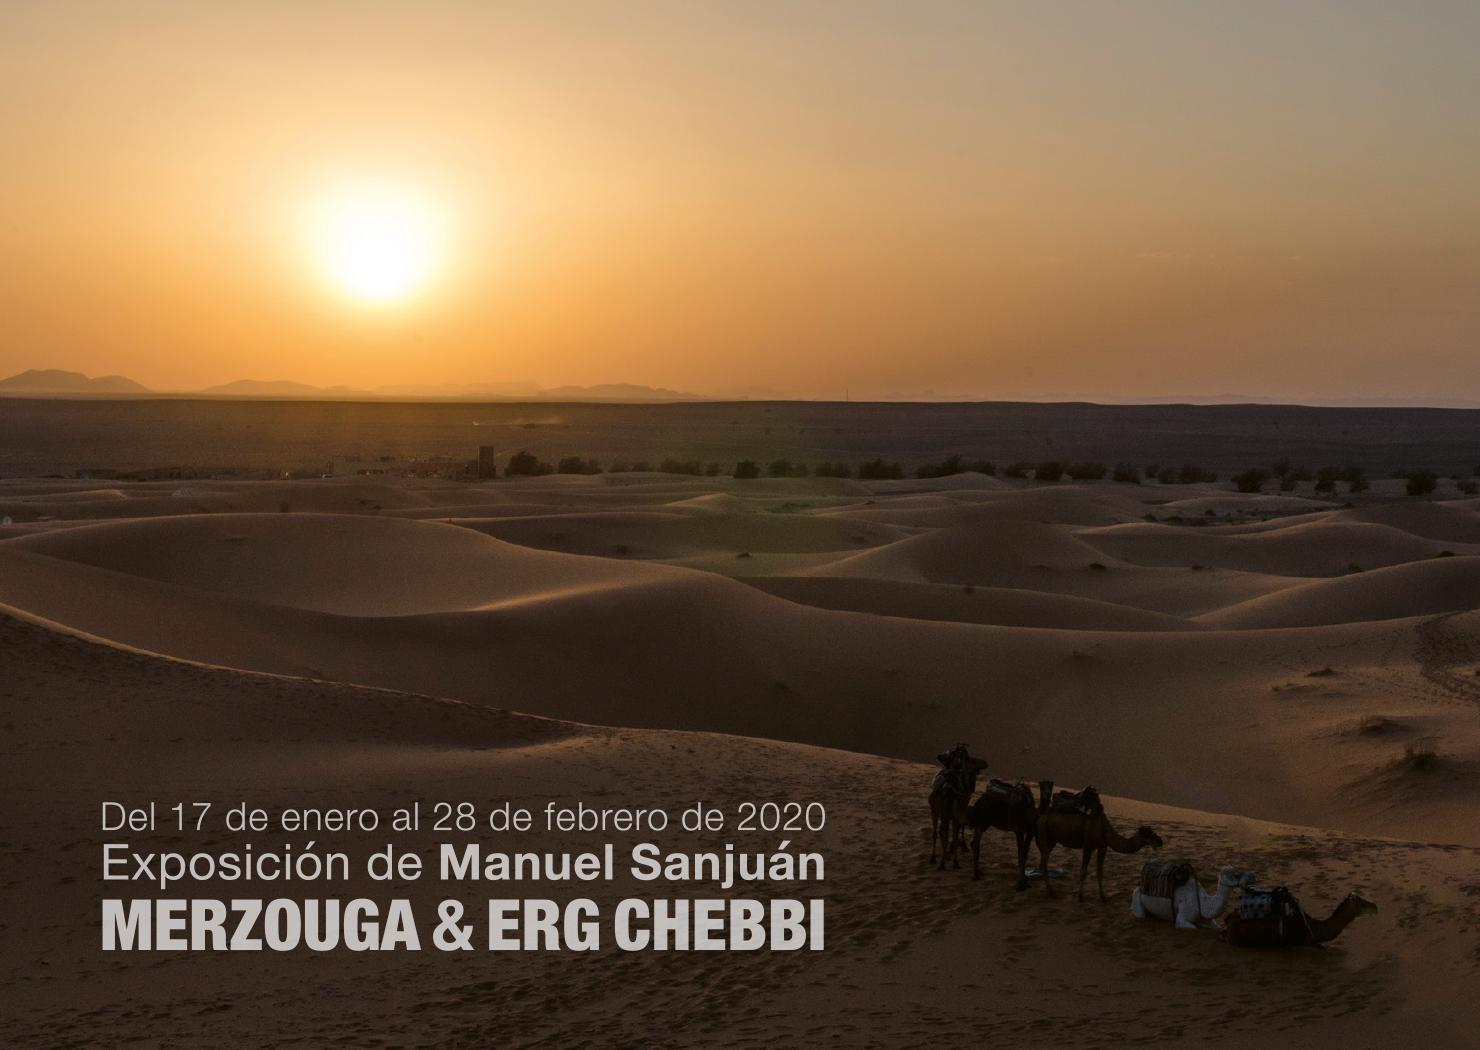 Merzouga & Erg Chebbi, de Manuel Sanjuán